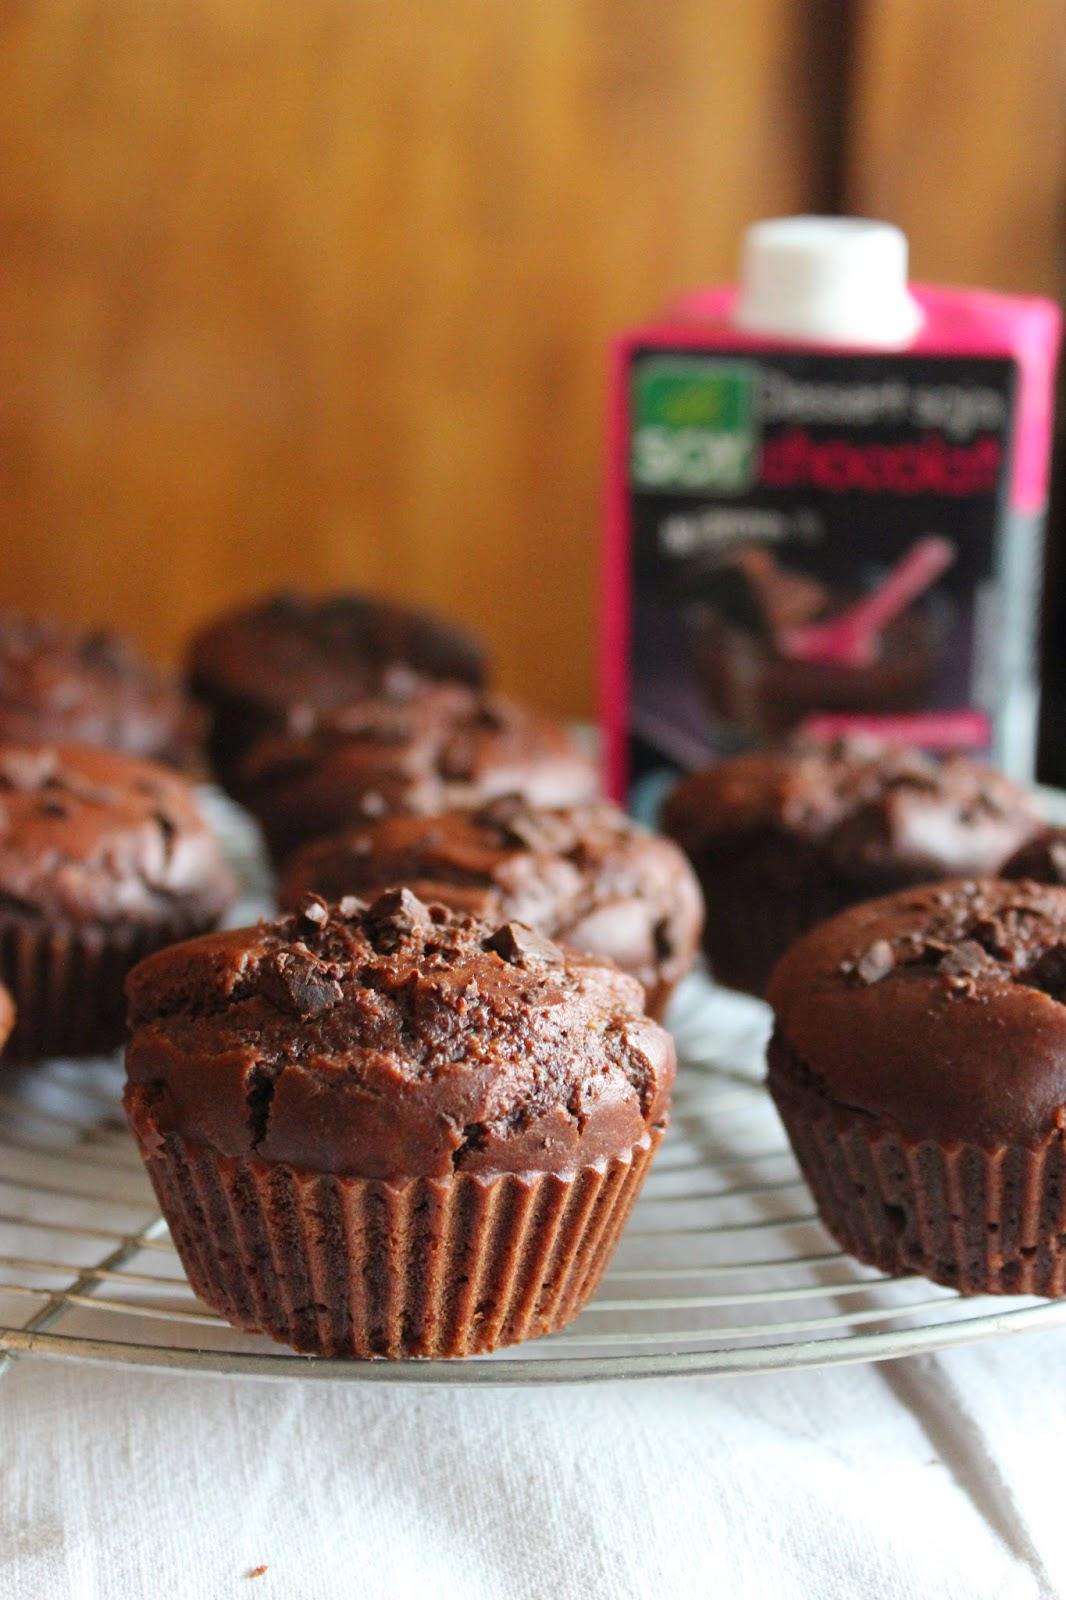 cuill 232 re et saladier muffins 224 la cr 232 me dessert au chocolat sans gluten